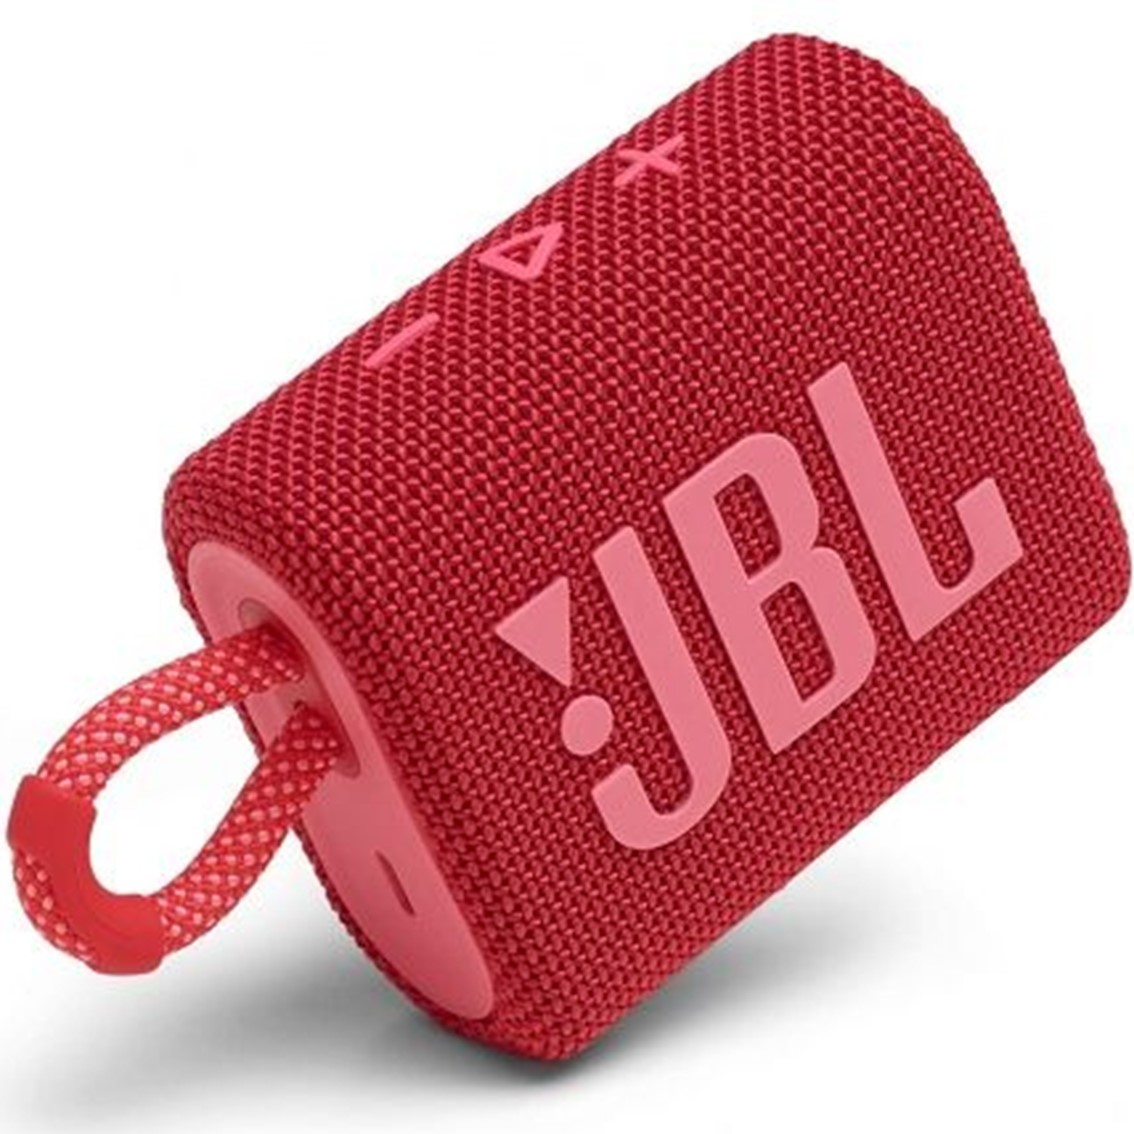 Altavoz bluetooth jbl go 3 red - 4.2w rms - ip67 - bateria 2.7wh - rojo